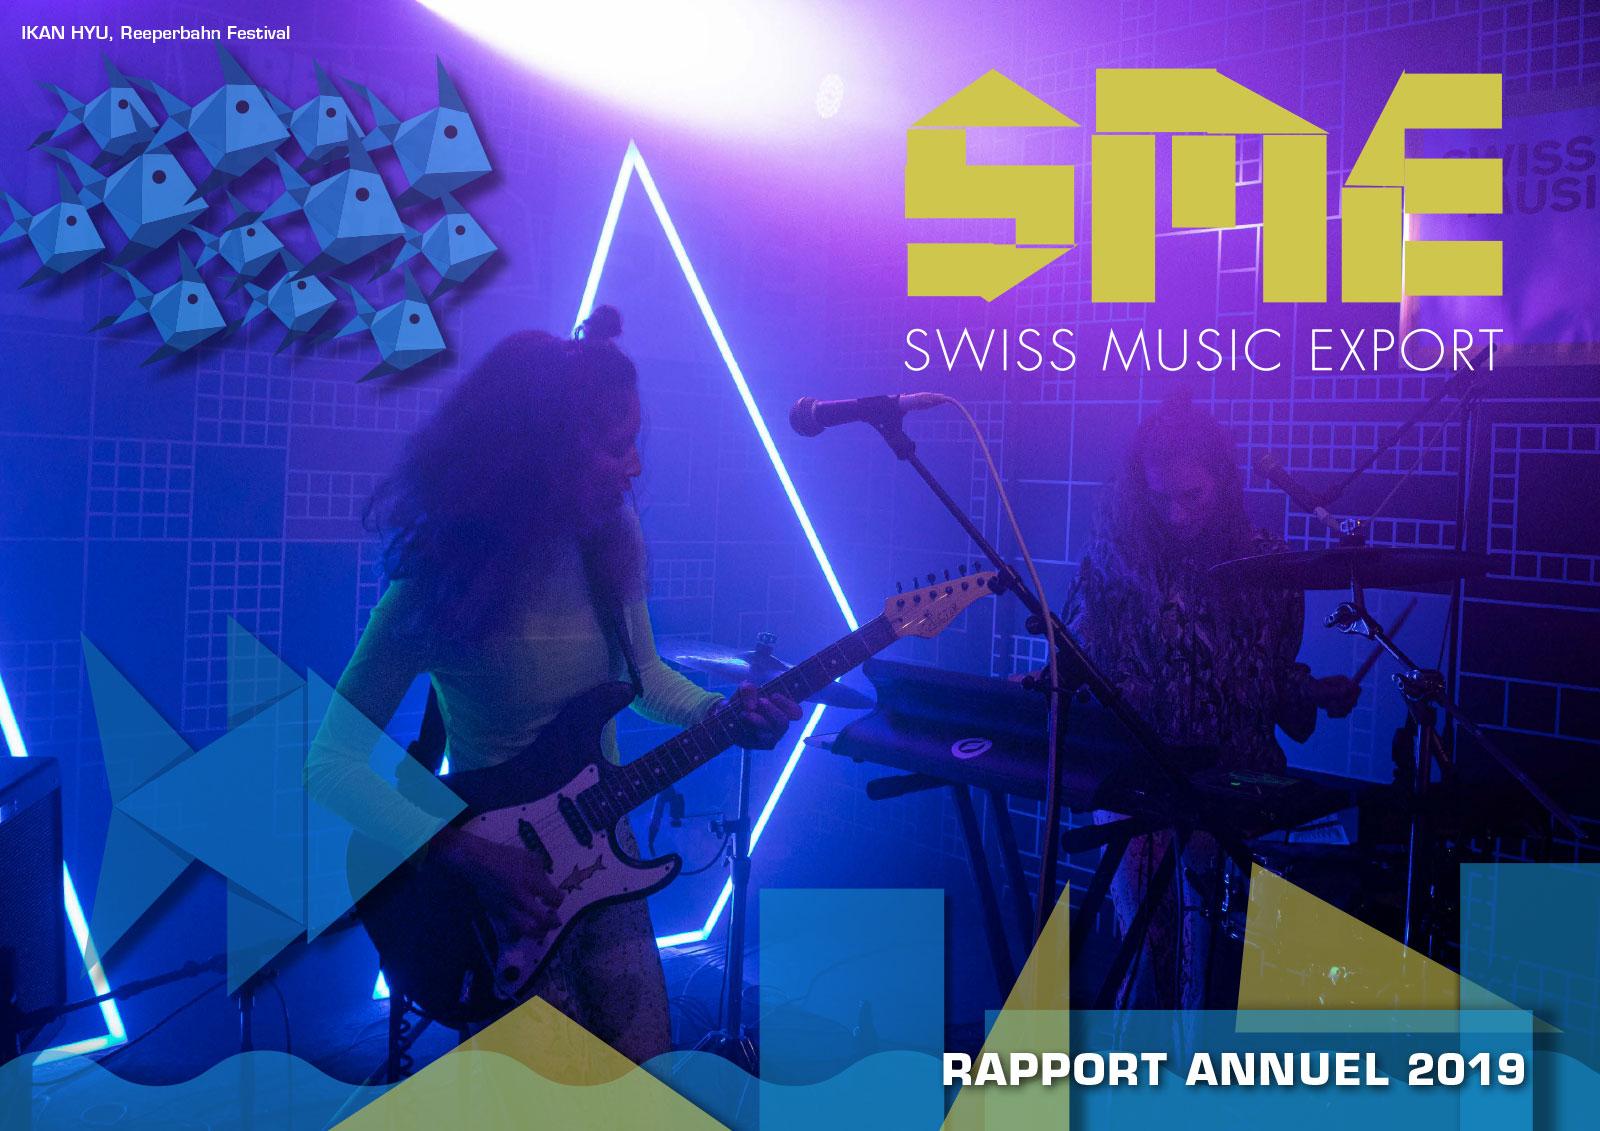 Swiss Music Export – Jahresberichte